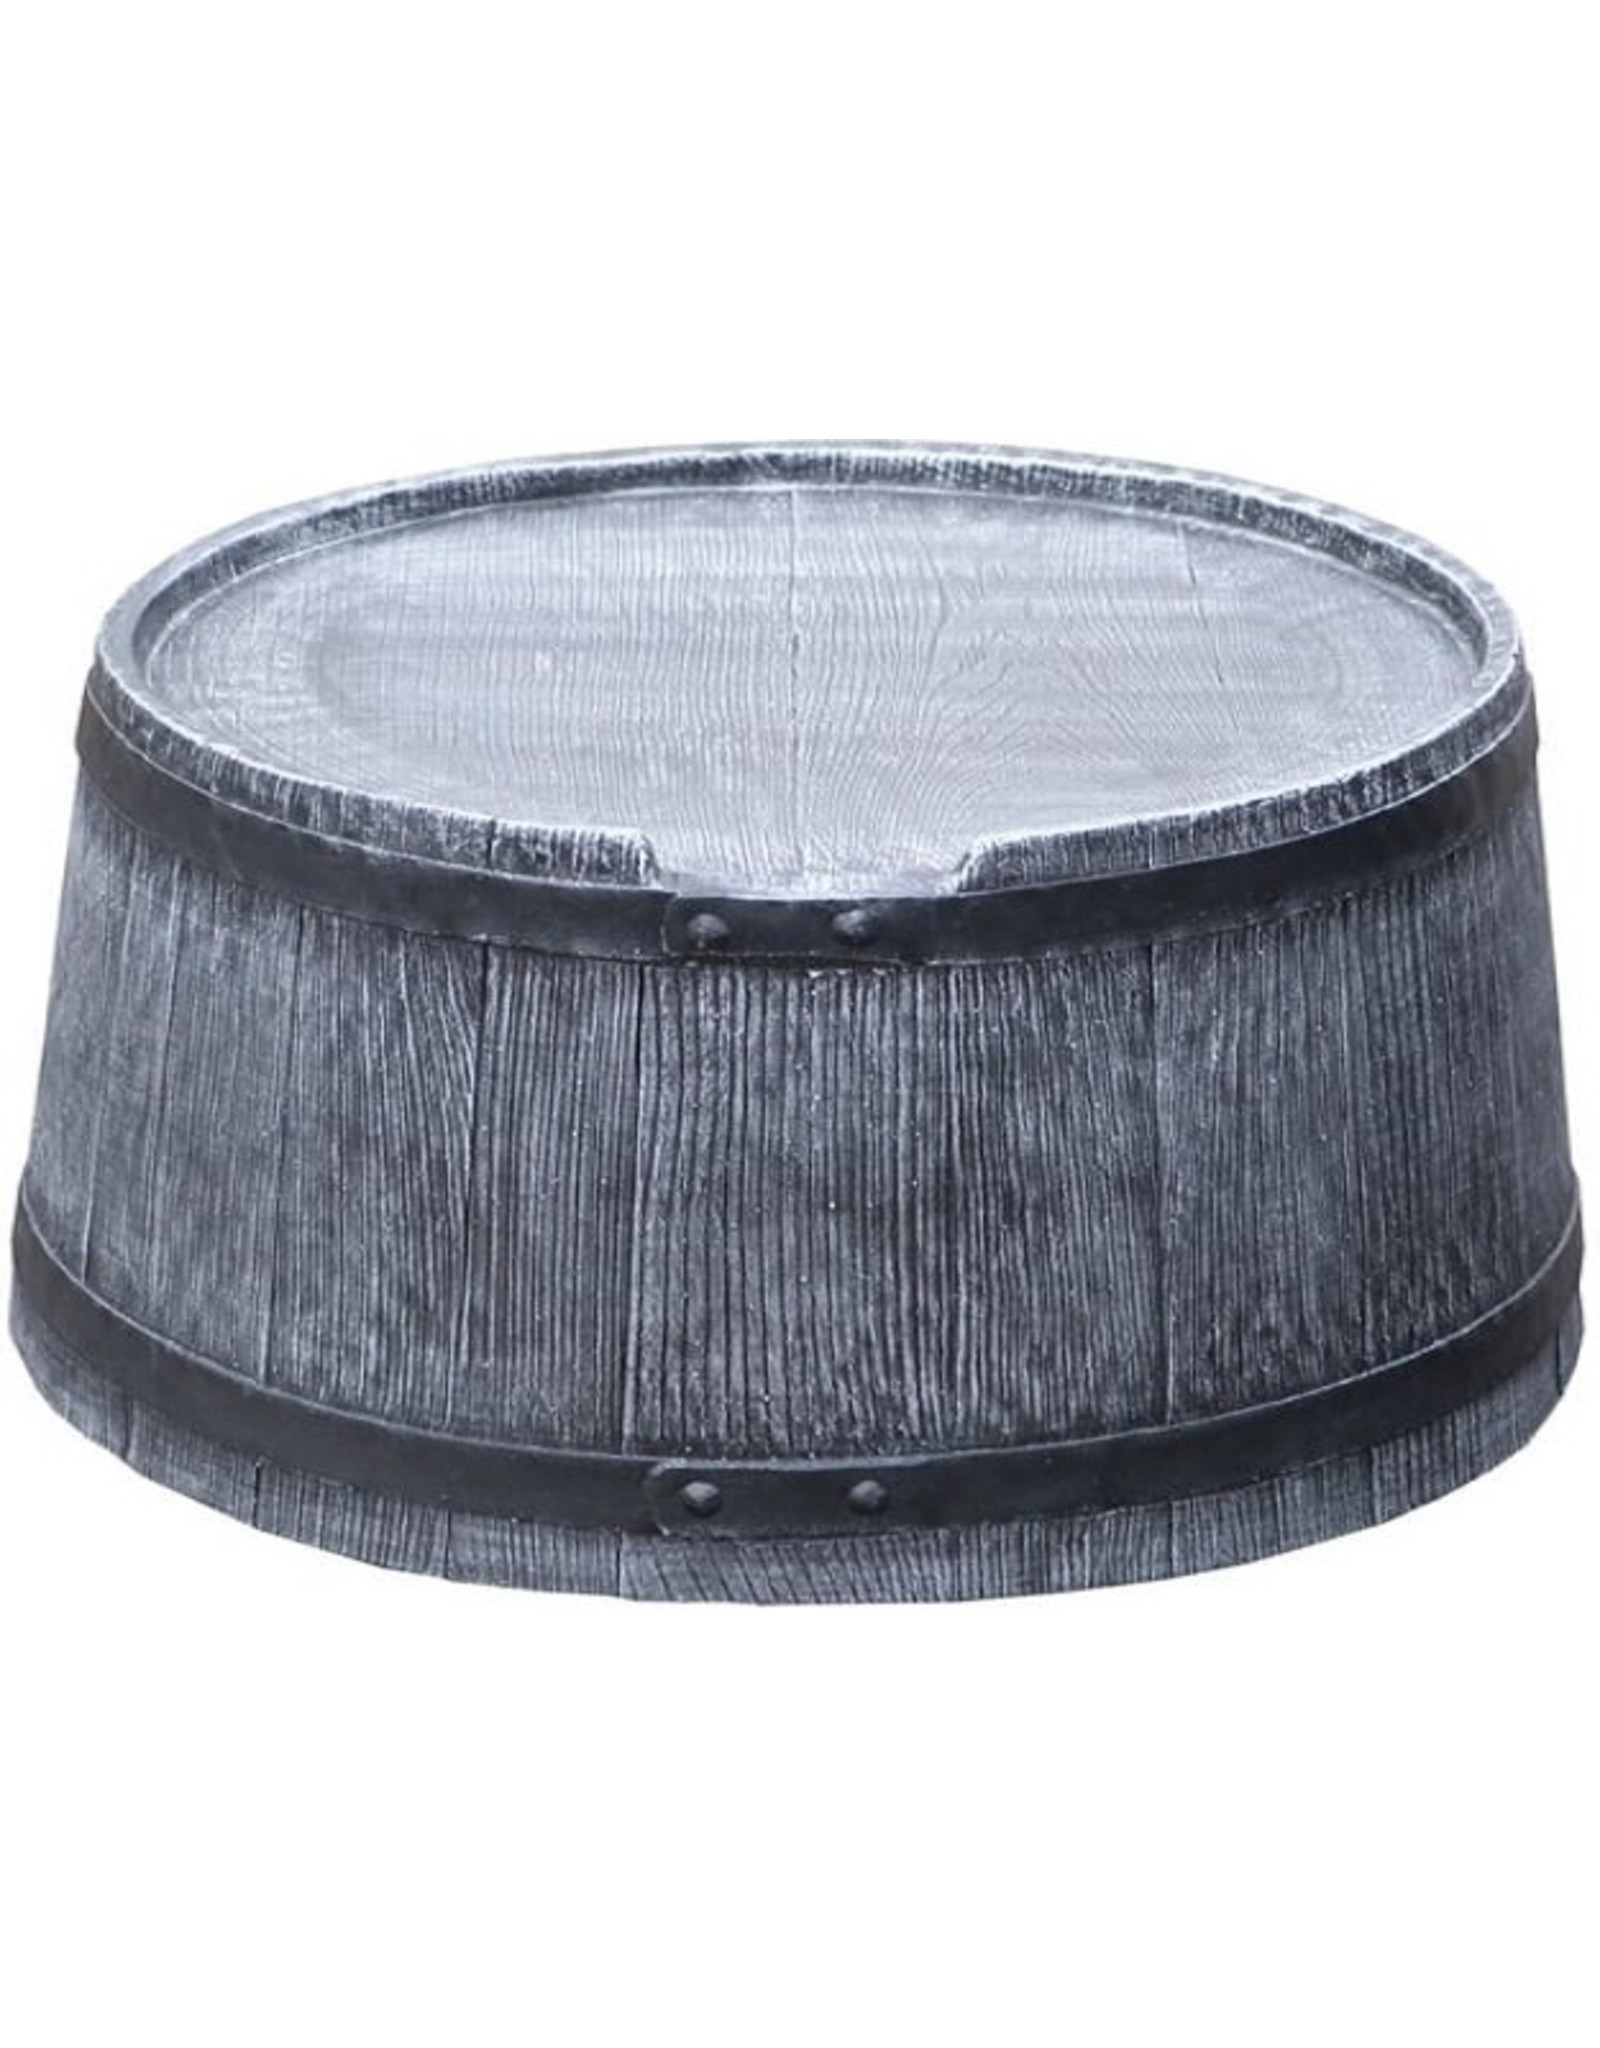 Roto standaard 240 liter grijs